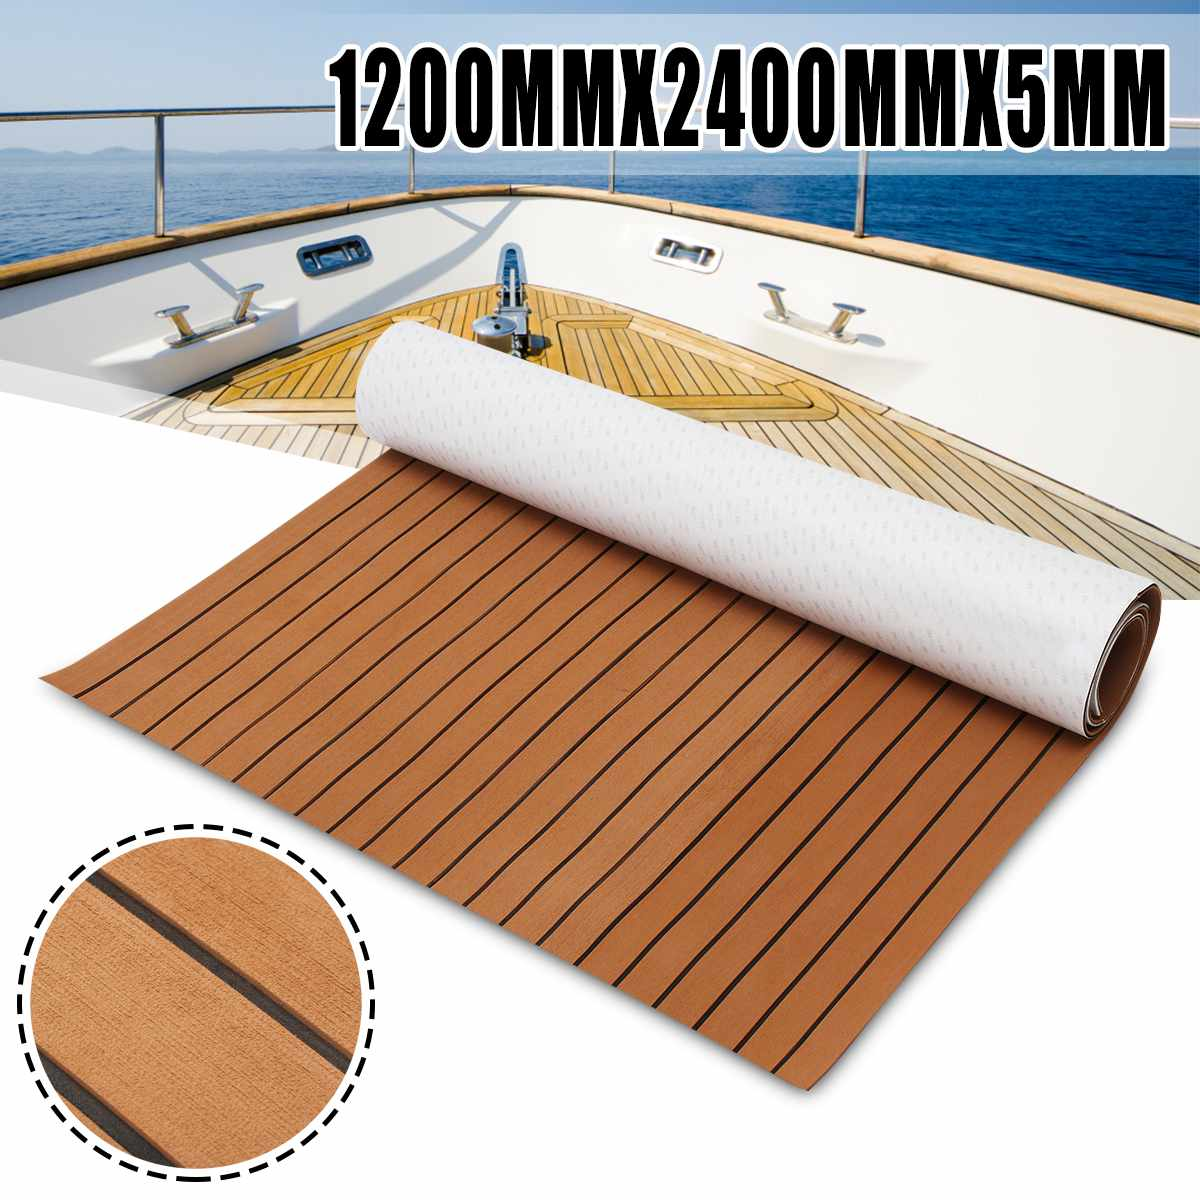 Self-Adhesive 1200mmx2400mmx5mm Foam Teak Decking EVA Foam Marine Flooring Faux Boat Decking Sheet Marine Brown Black